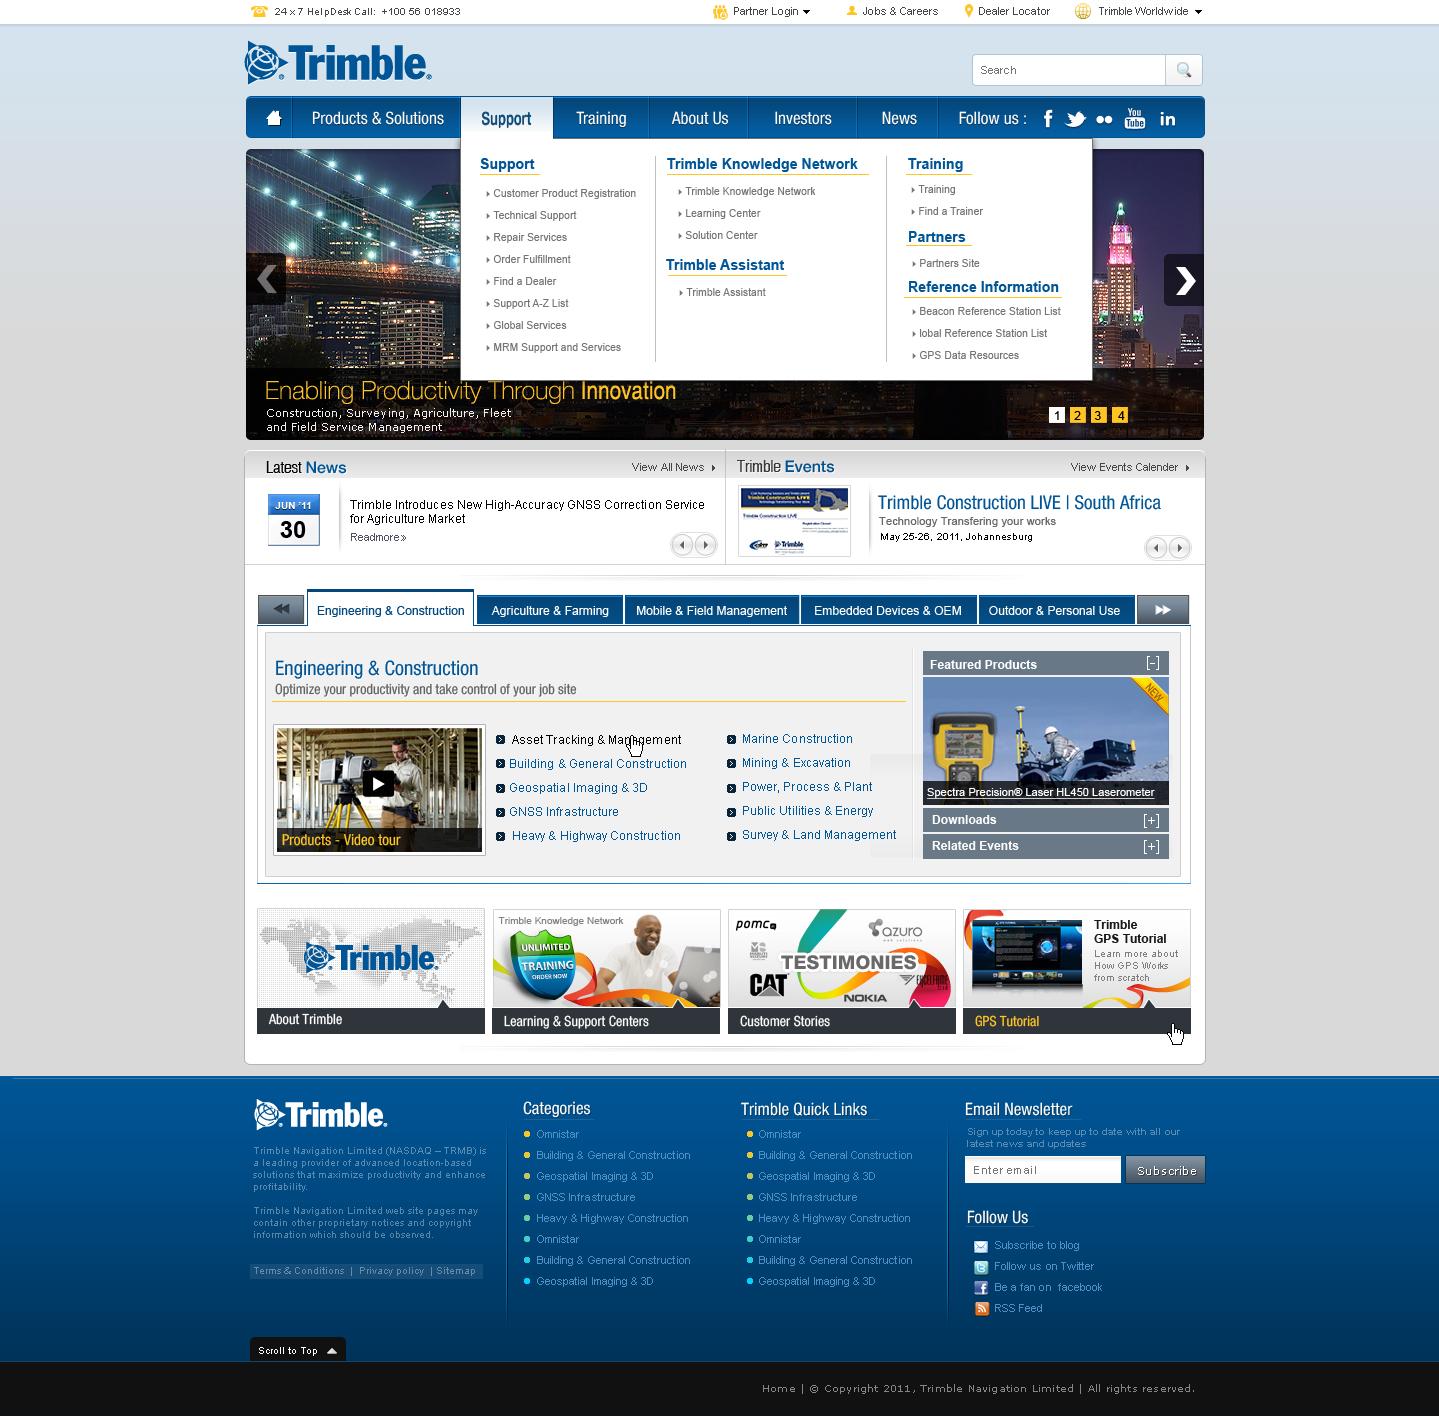 trimble website mockup design by jamnicky on DeviantArt